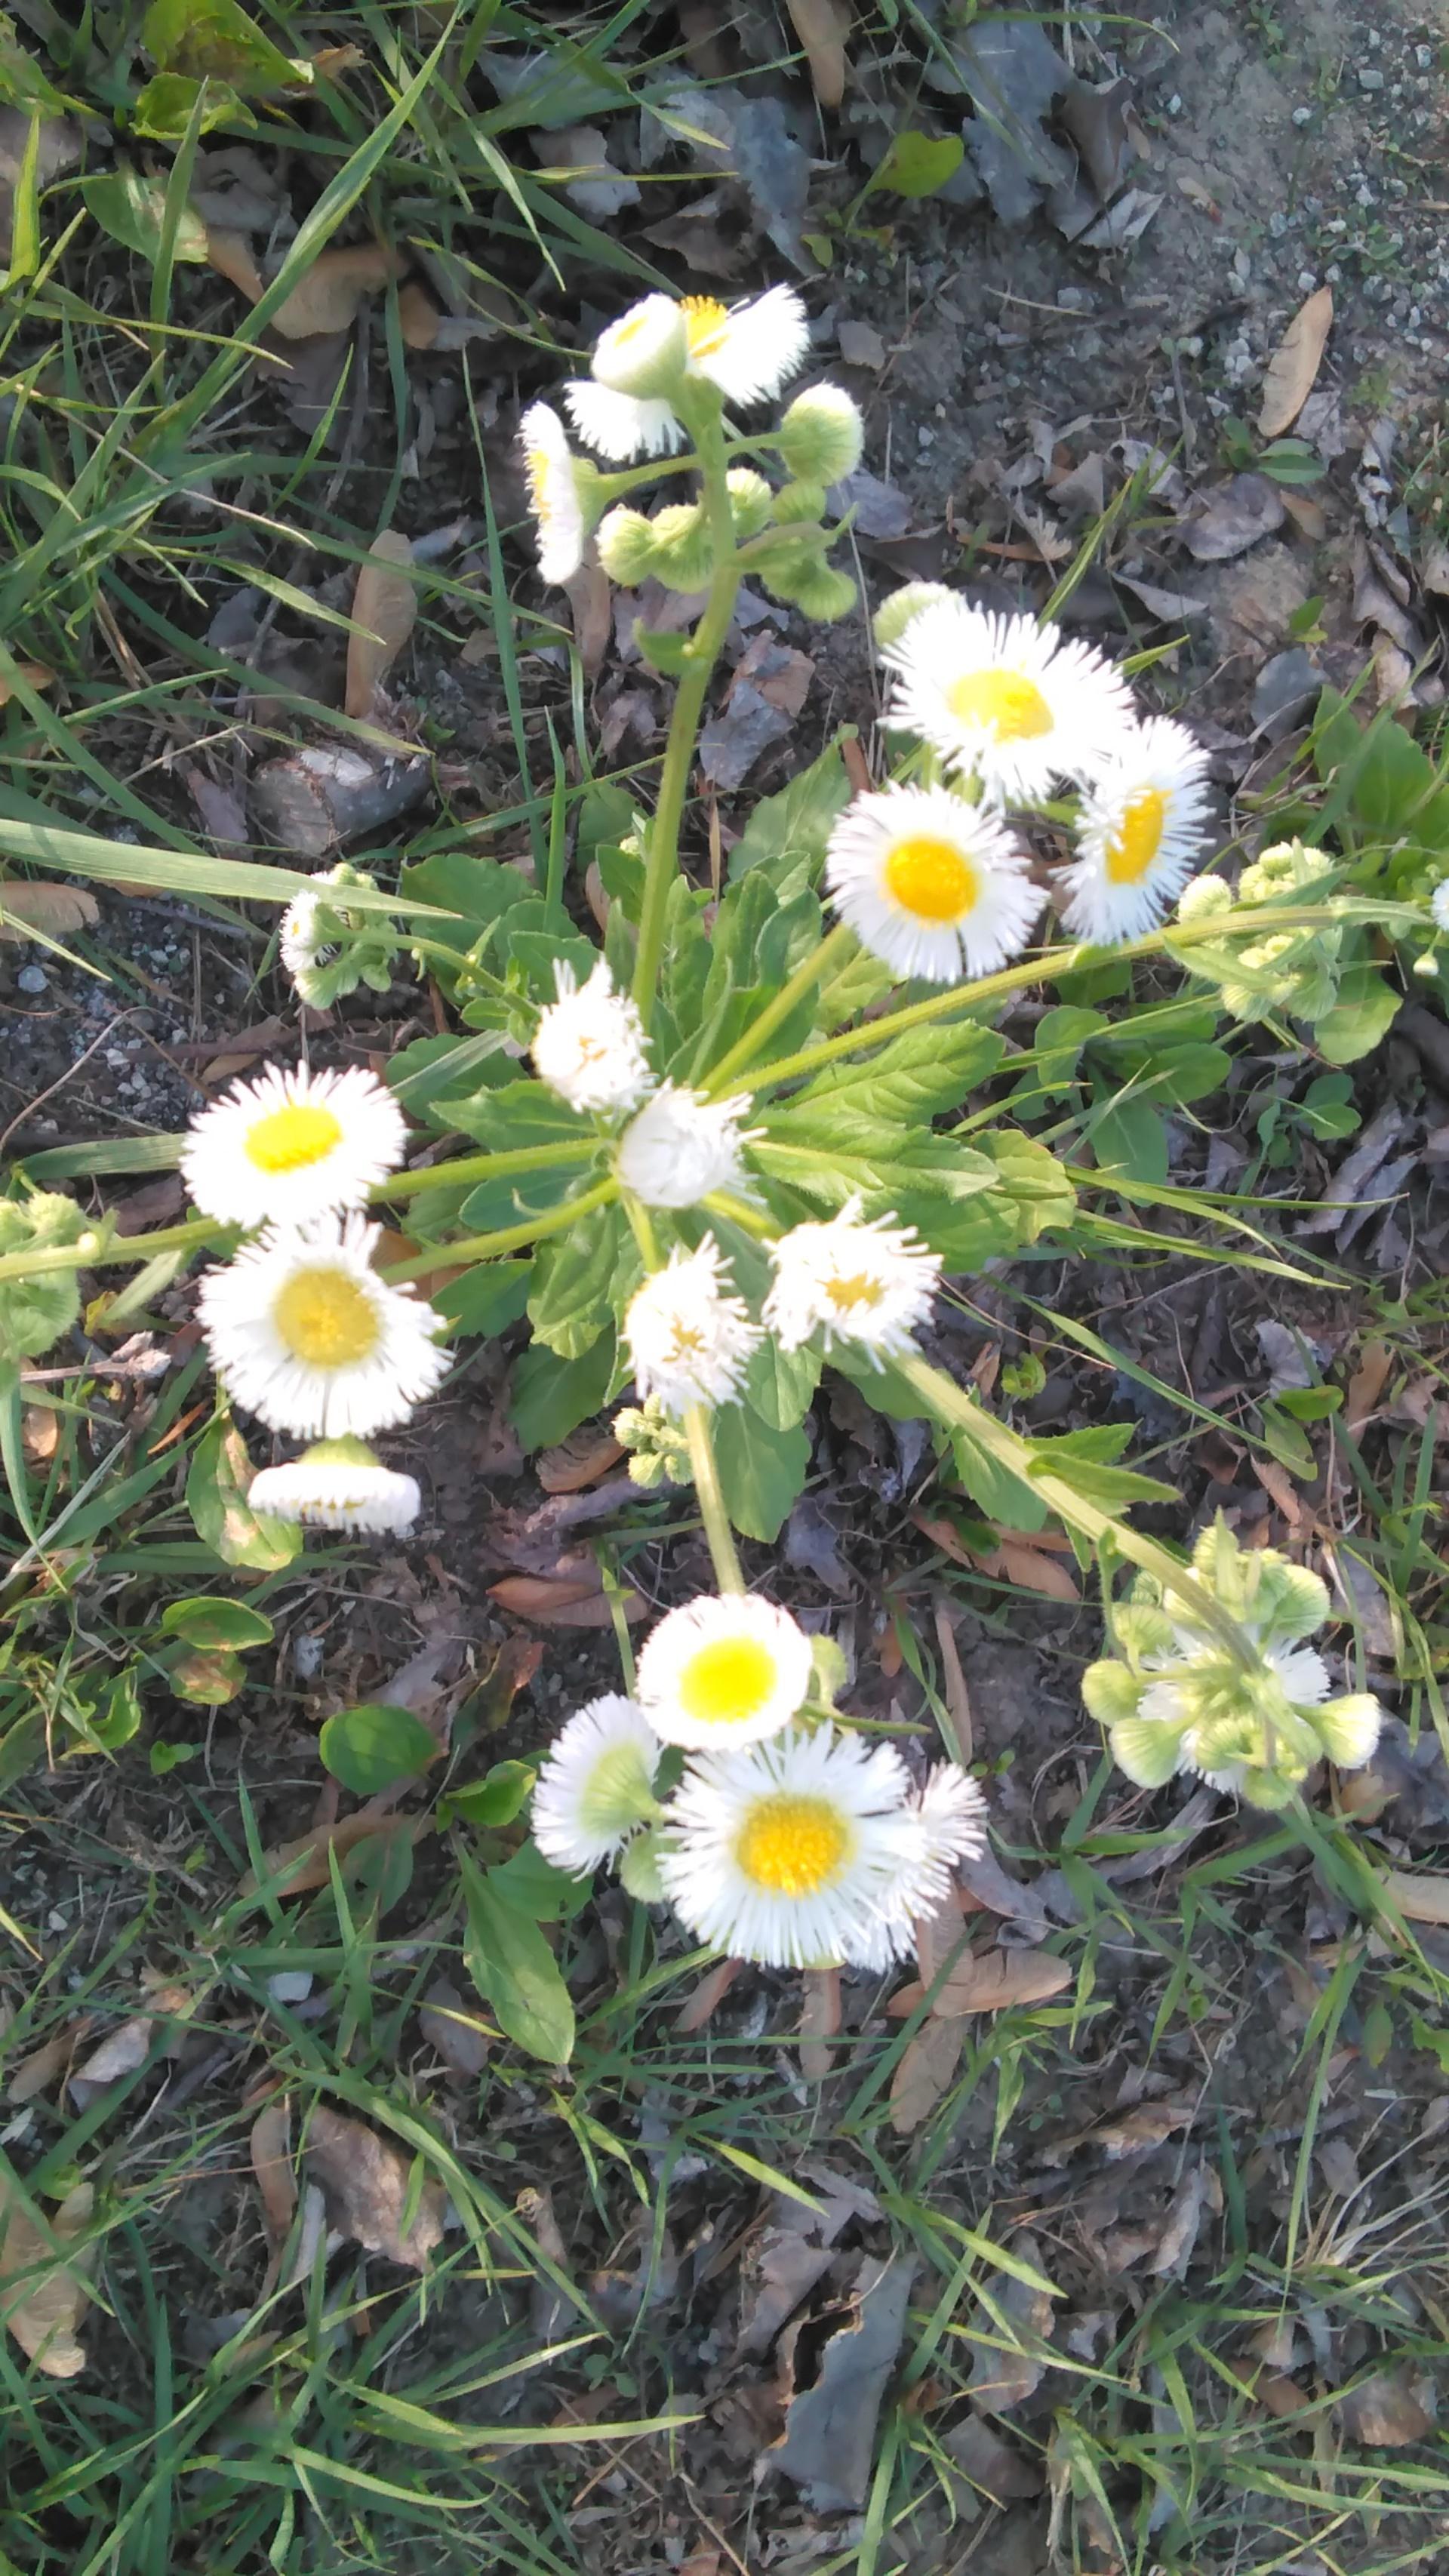 Daisy spray | codenamesailorearth, bloom, blossom, closeup